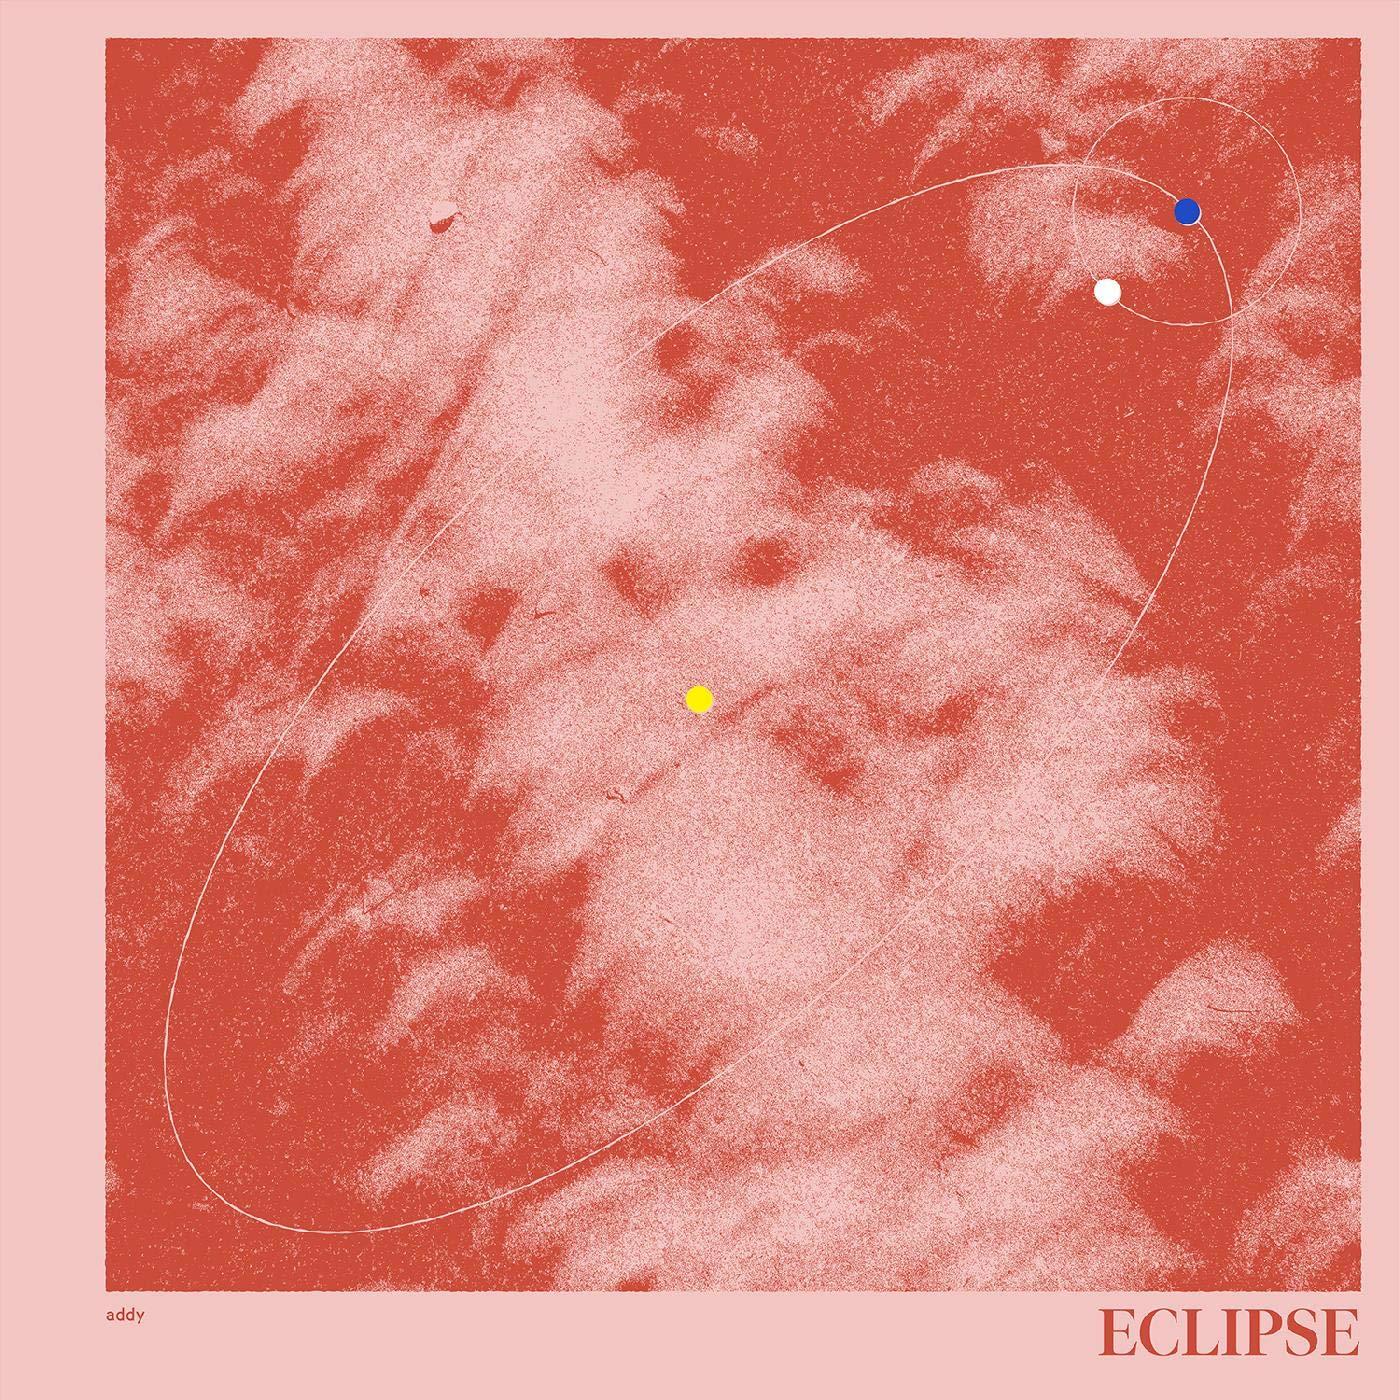 addy eclipse